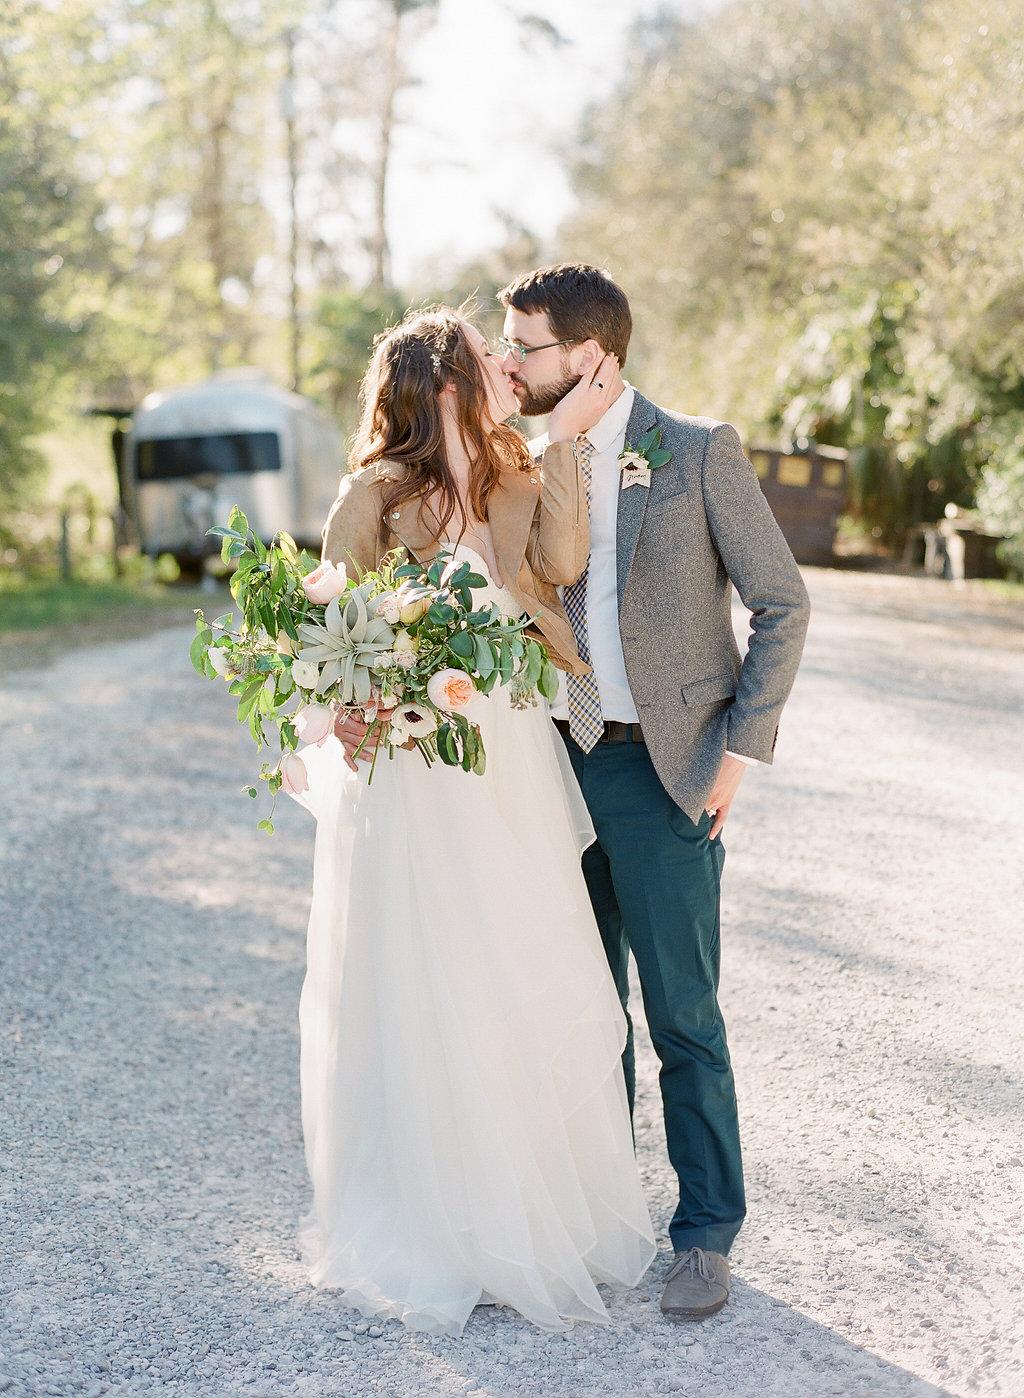 the-wyld-dock-bar-wedding-savannah-weddings-ivory-and-beau-savannah-bridal-boutique-savannah-wedding-dresses-savannah-bridal-shop-sarah-seven-worthington-organza-wedding-dress-savannah-wedding-florist-bouquet.jpg